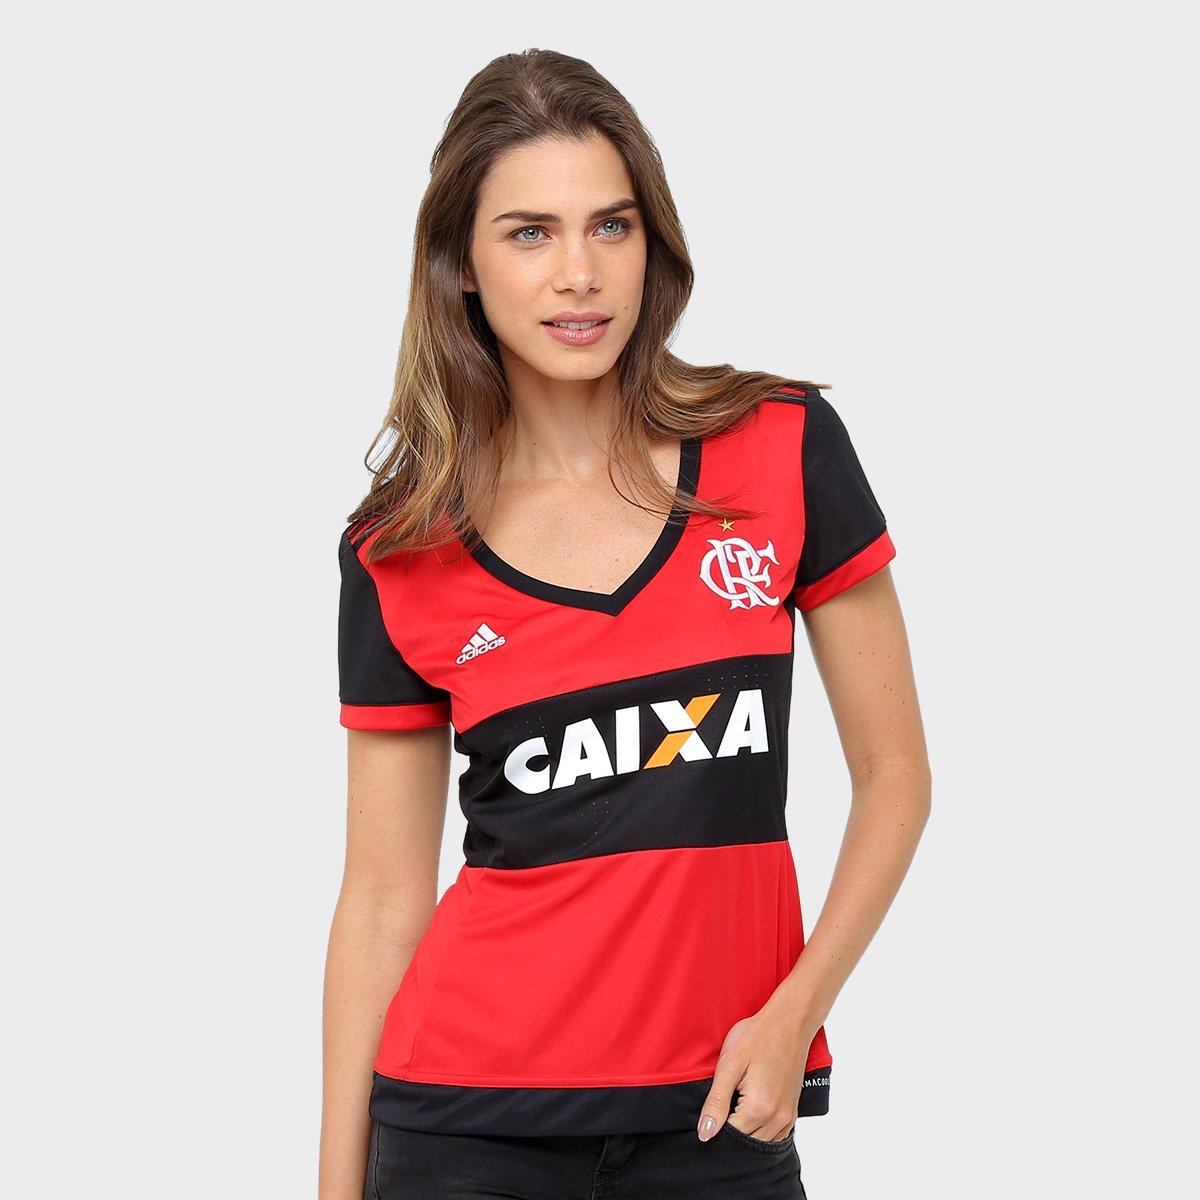 071d32b76 Camisa Flamengo I 17 18 s n° - c  Patrocinio Torcedor Adidas